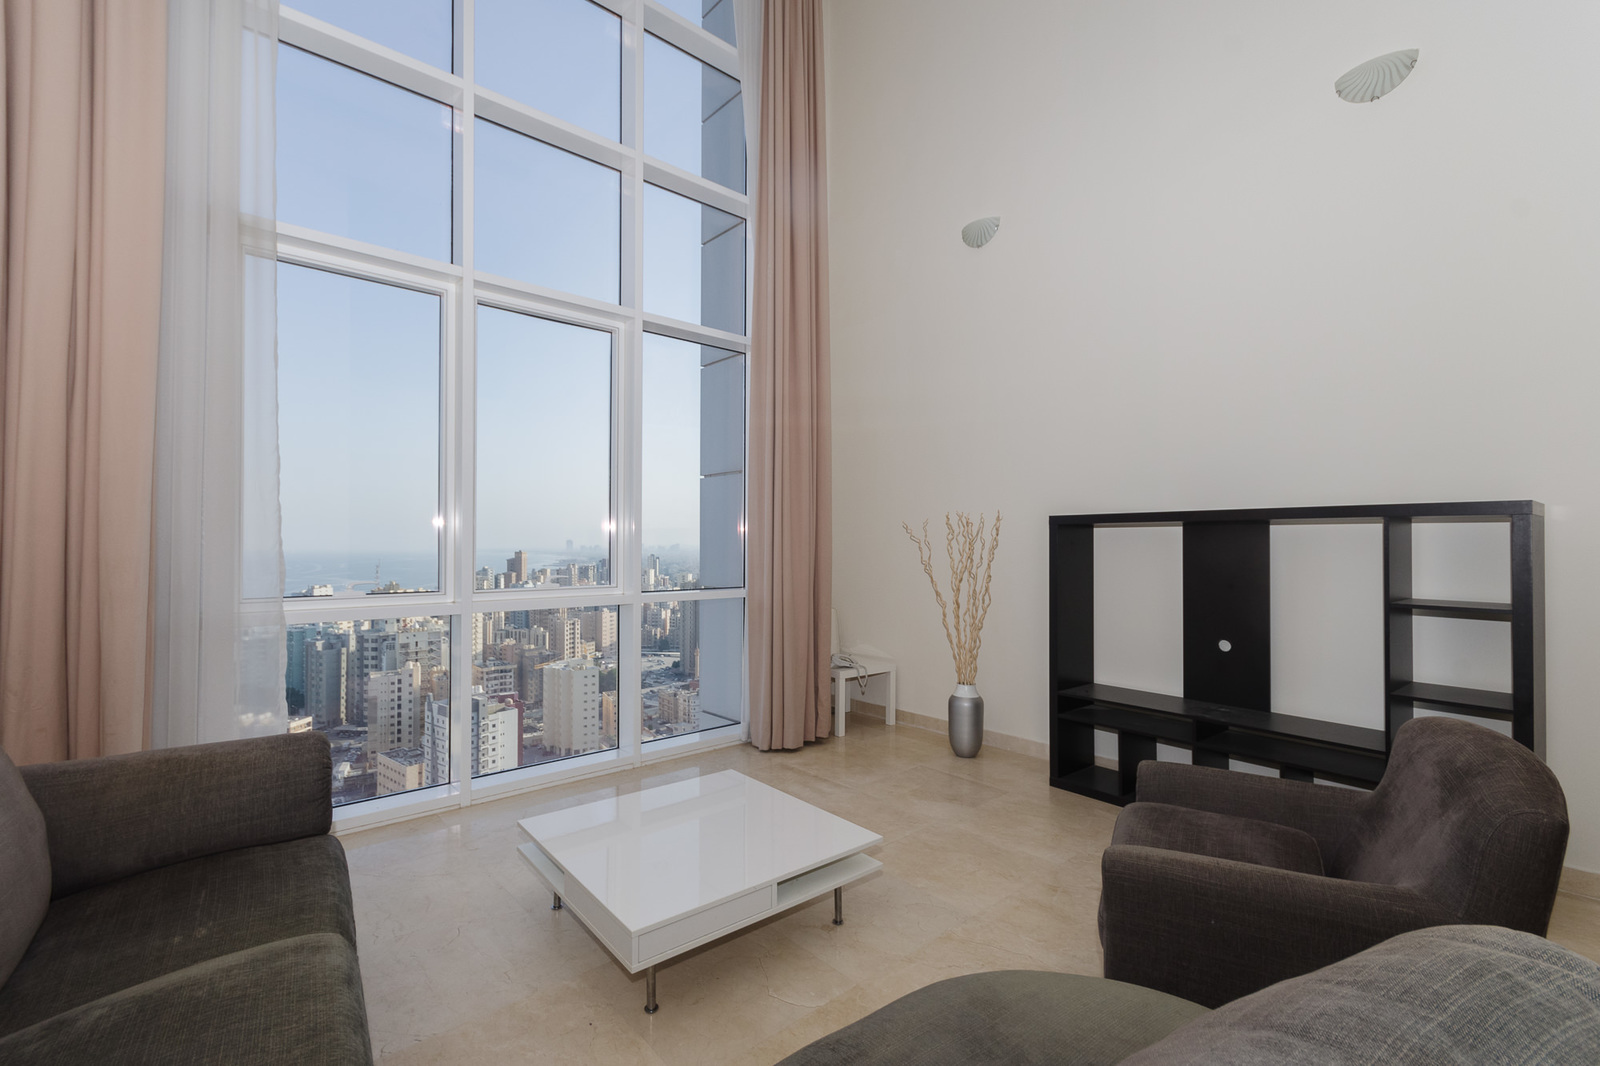 Salmiya – unfurnished, three bedroom penthouse